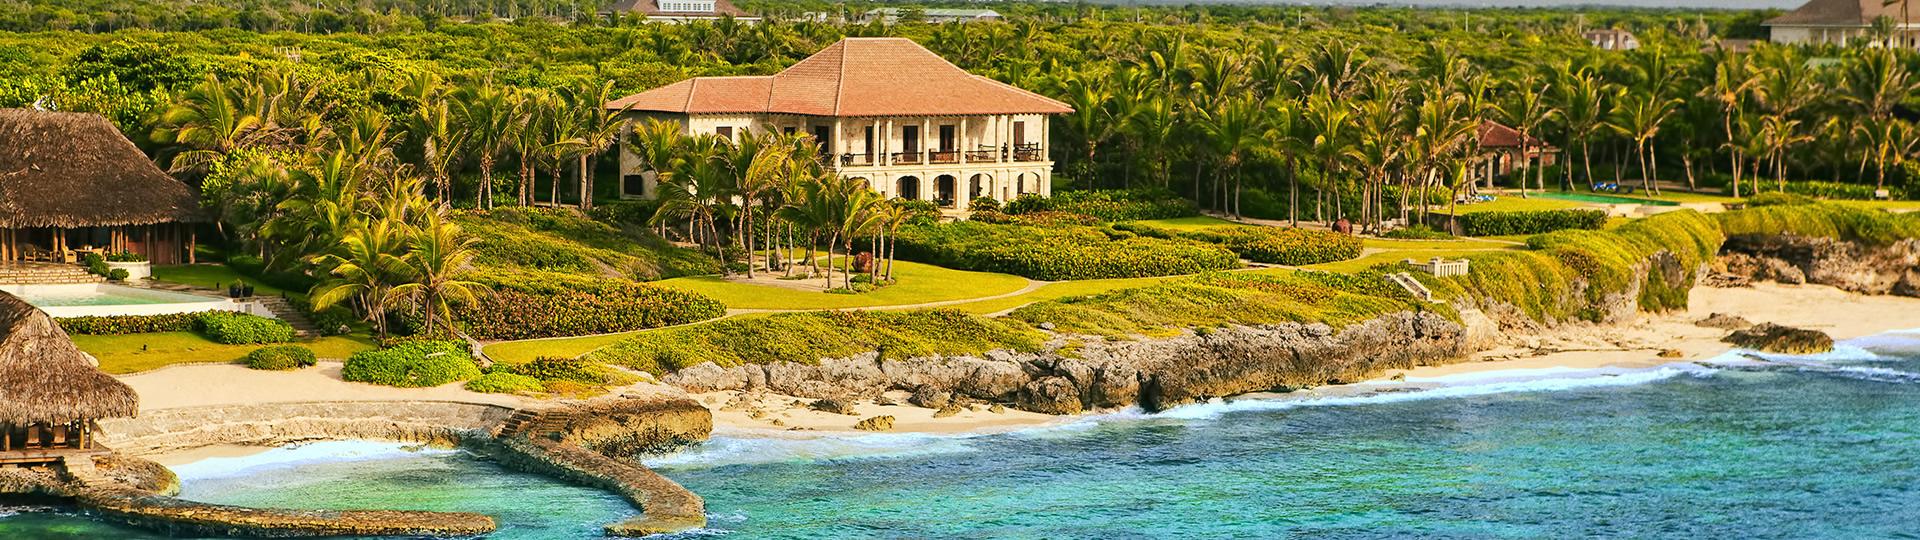 Dominican Republic Real Estate - The Estates at Puntacana